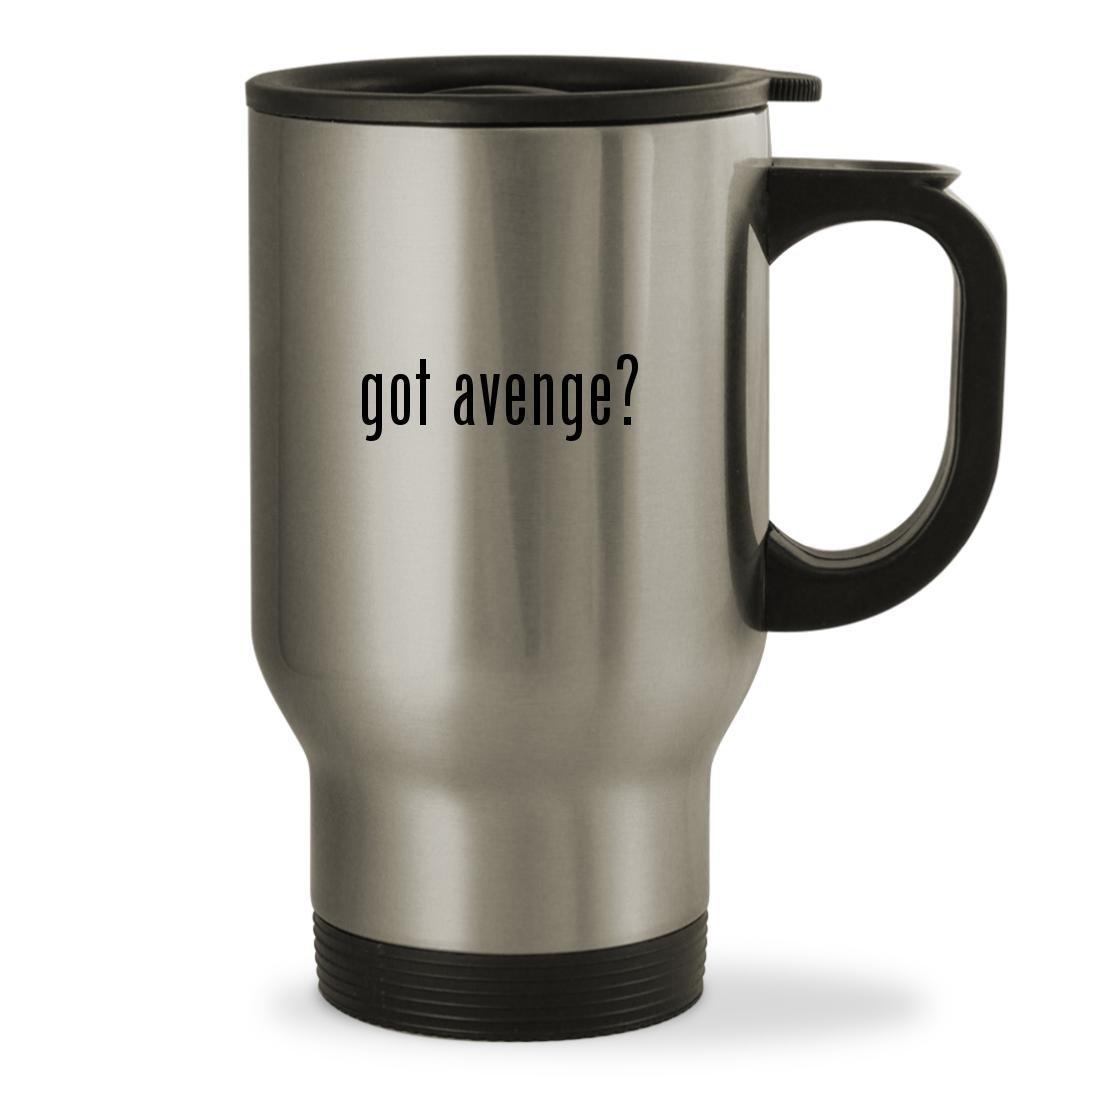 got avenge? - 14oz Sturdy Stainless Steel Travel Mug, Silver